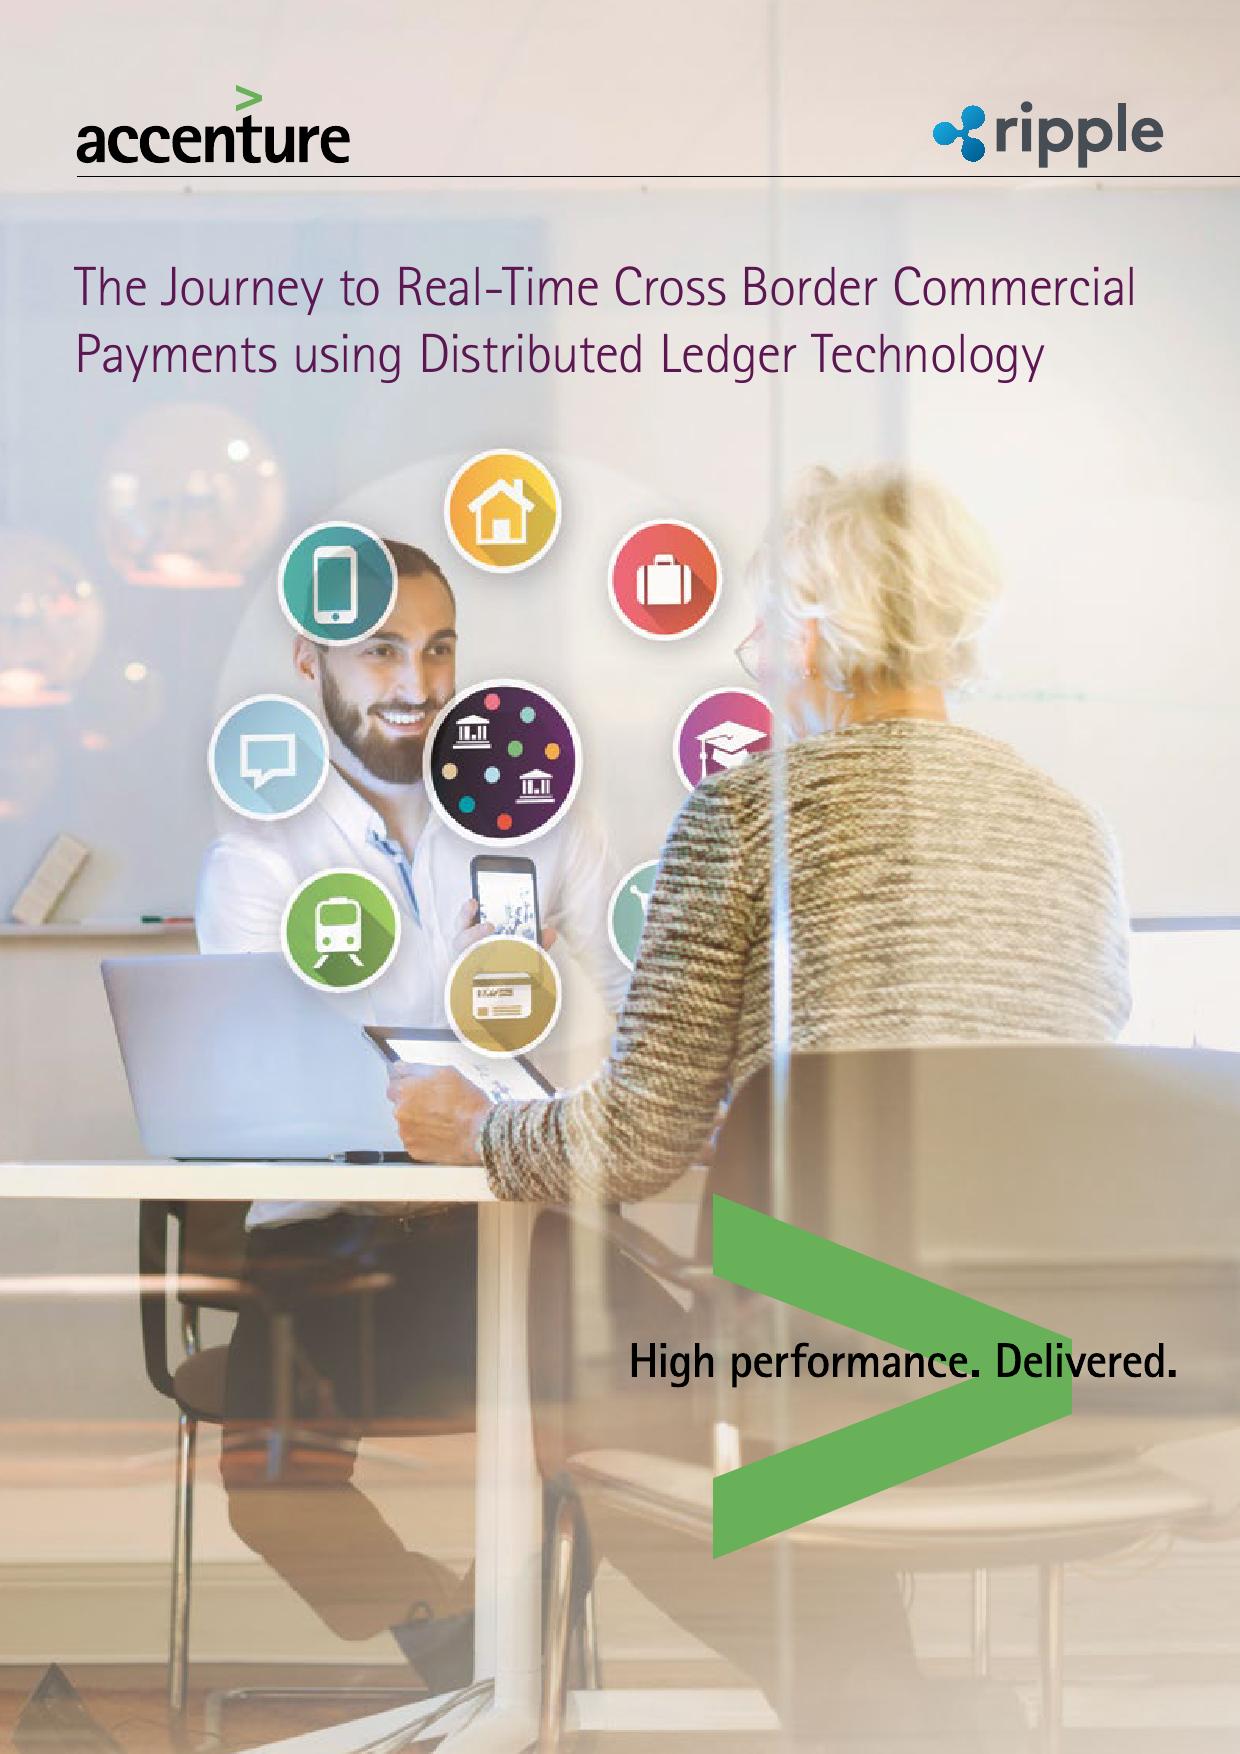 Accenture_Ripple_CrossBorderPayments_000001